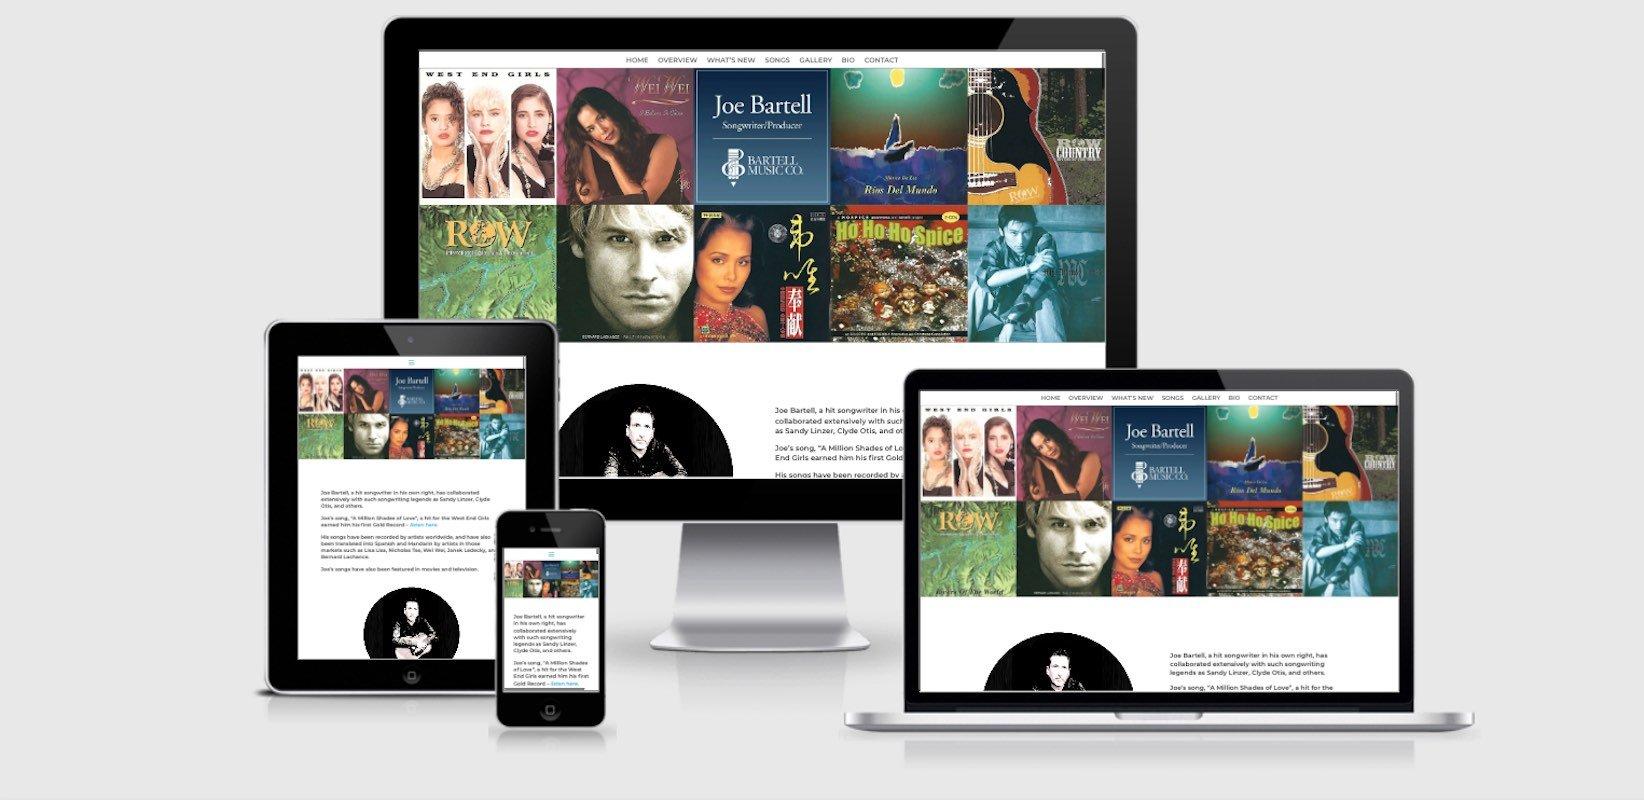 Joe Bartell Website by Amalam Media